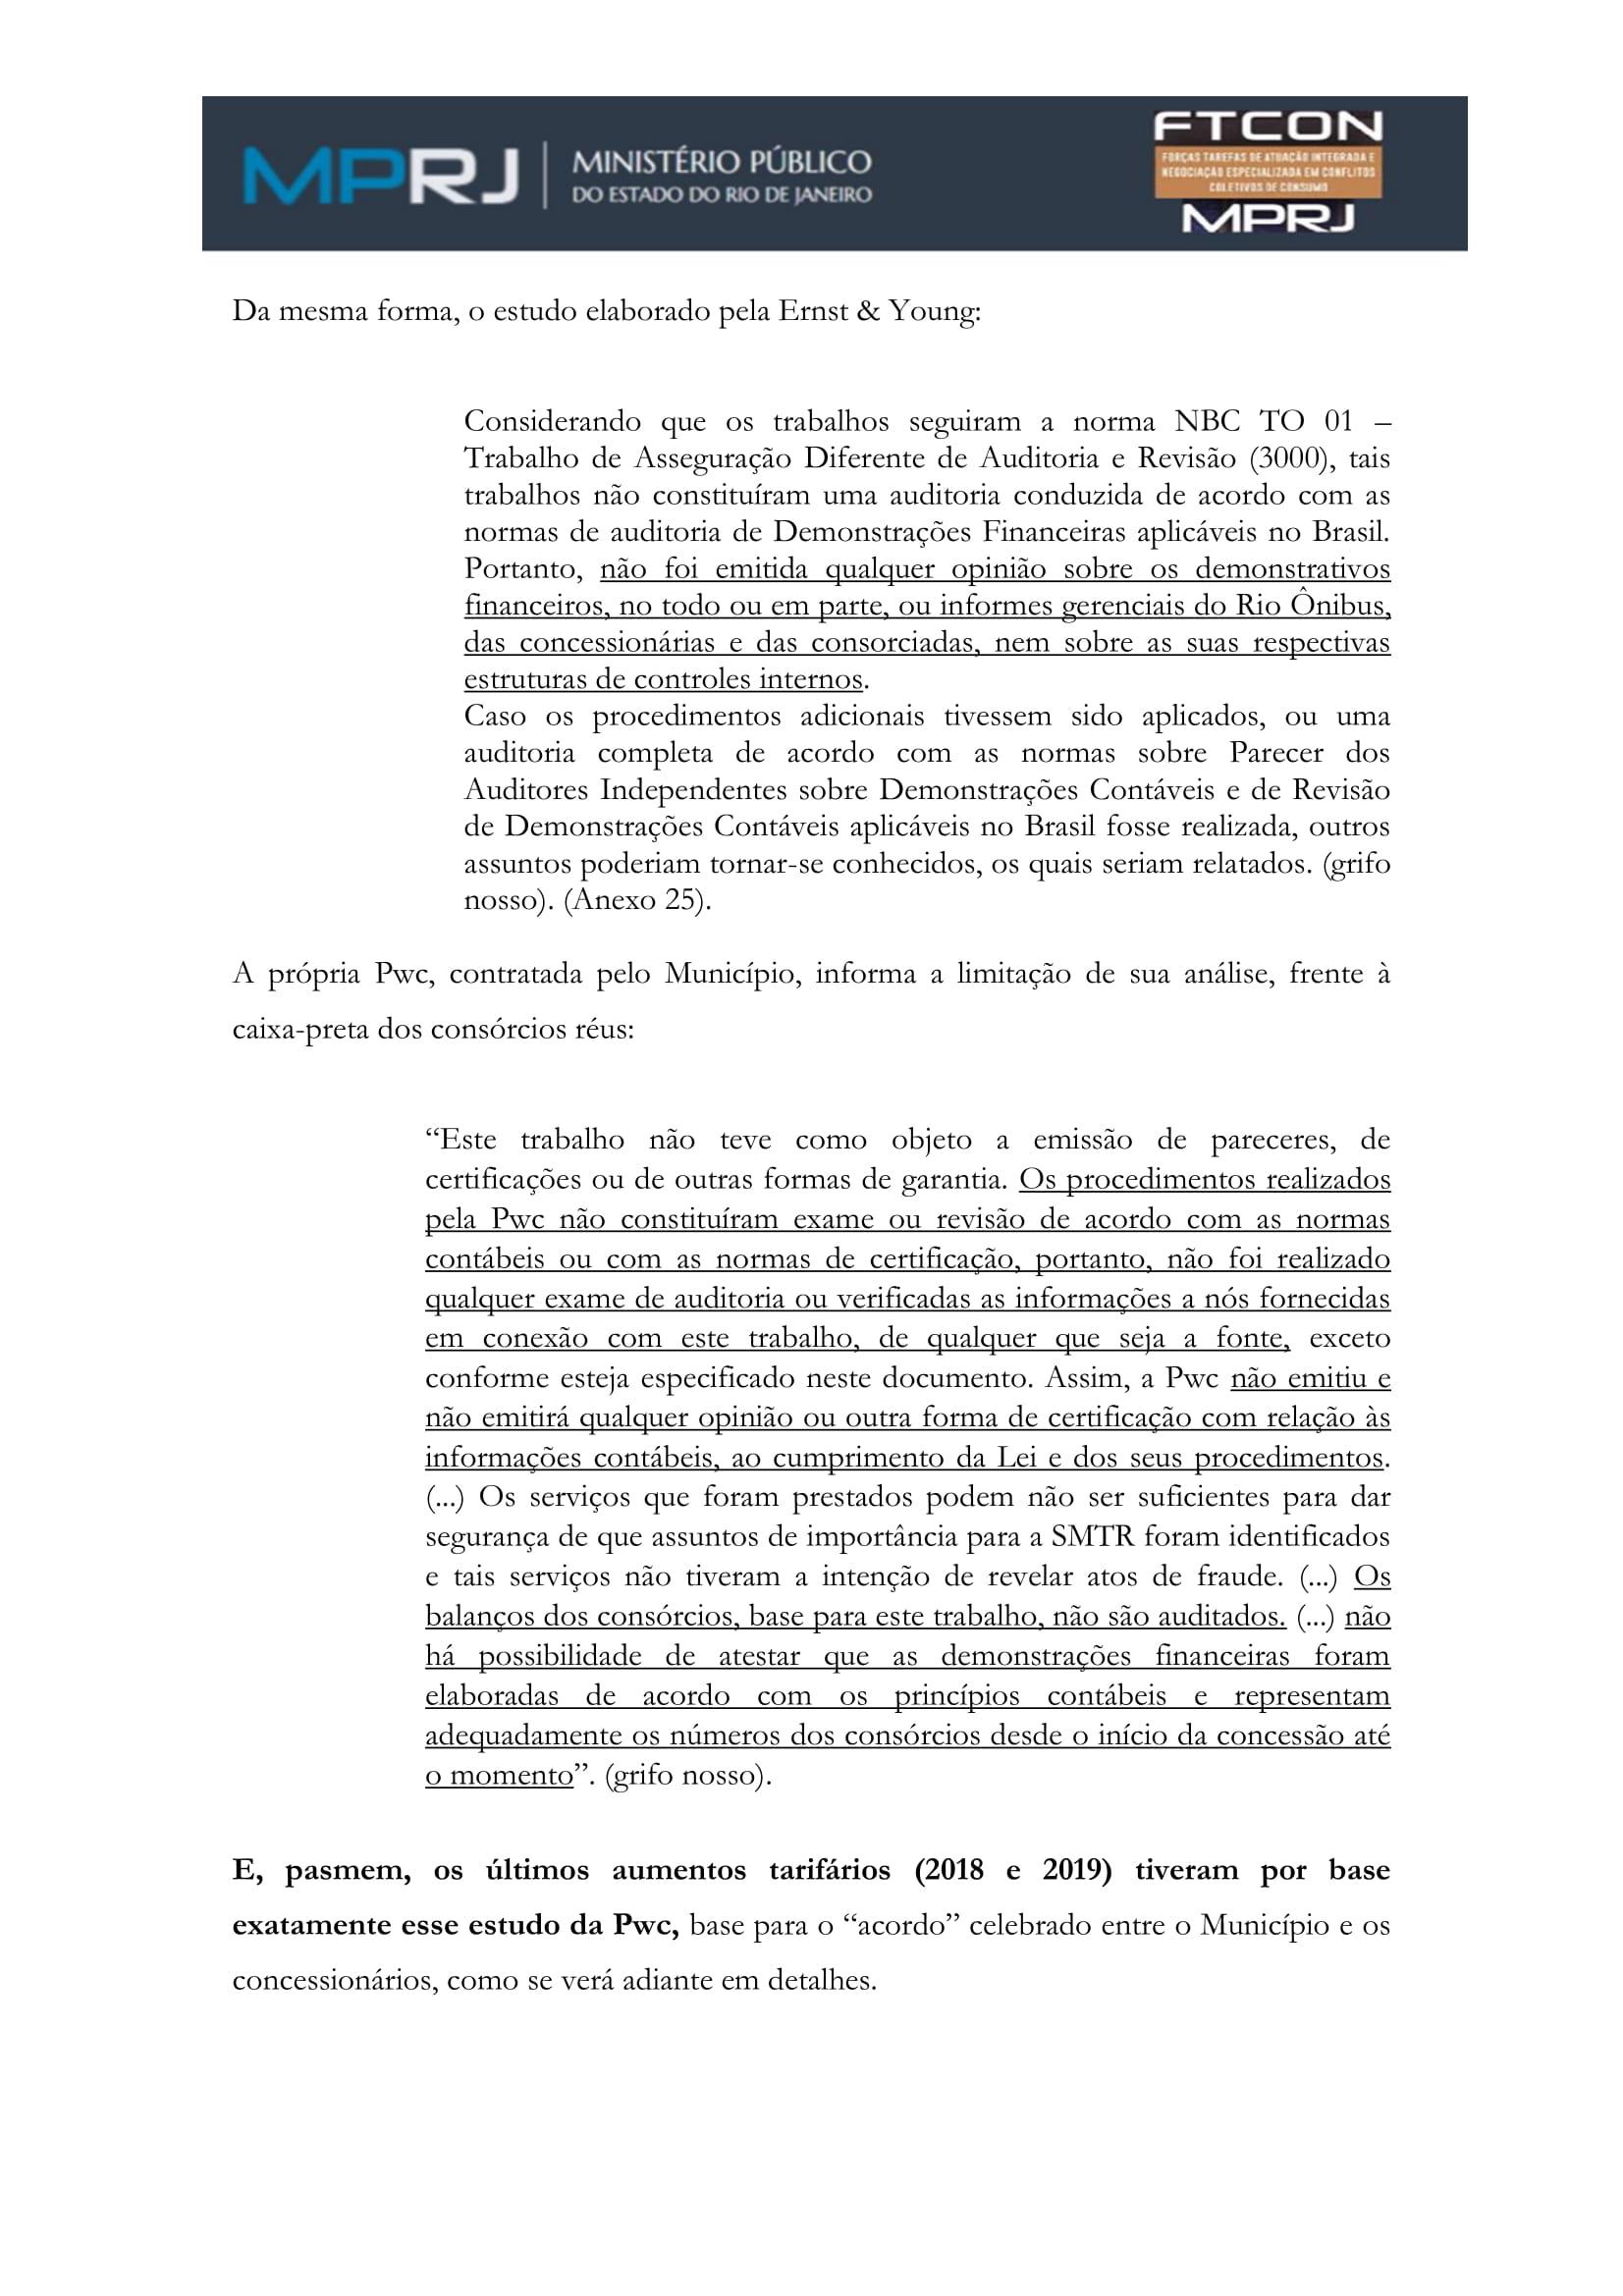 acp_caducidade_onibus_dr_rt-049